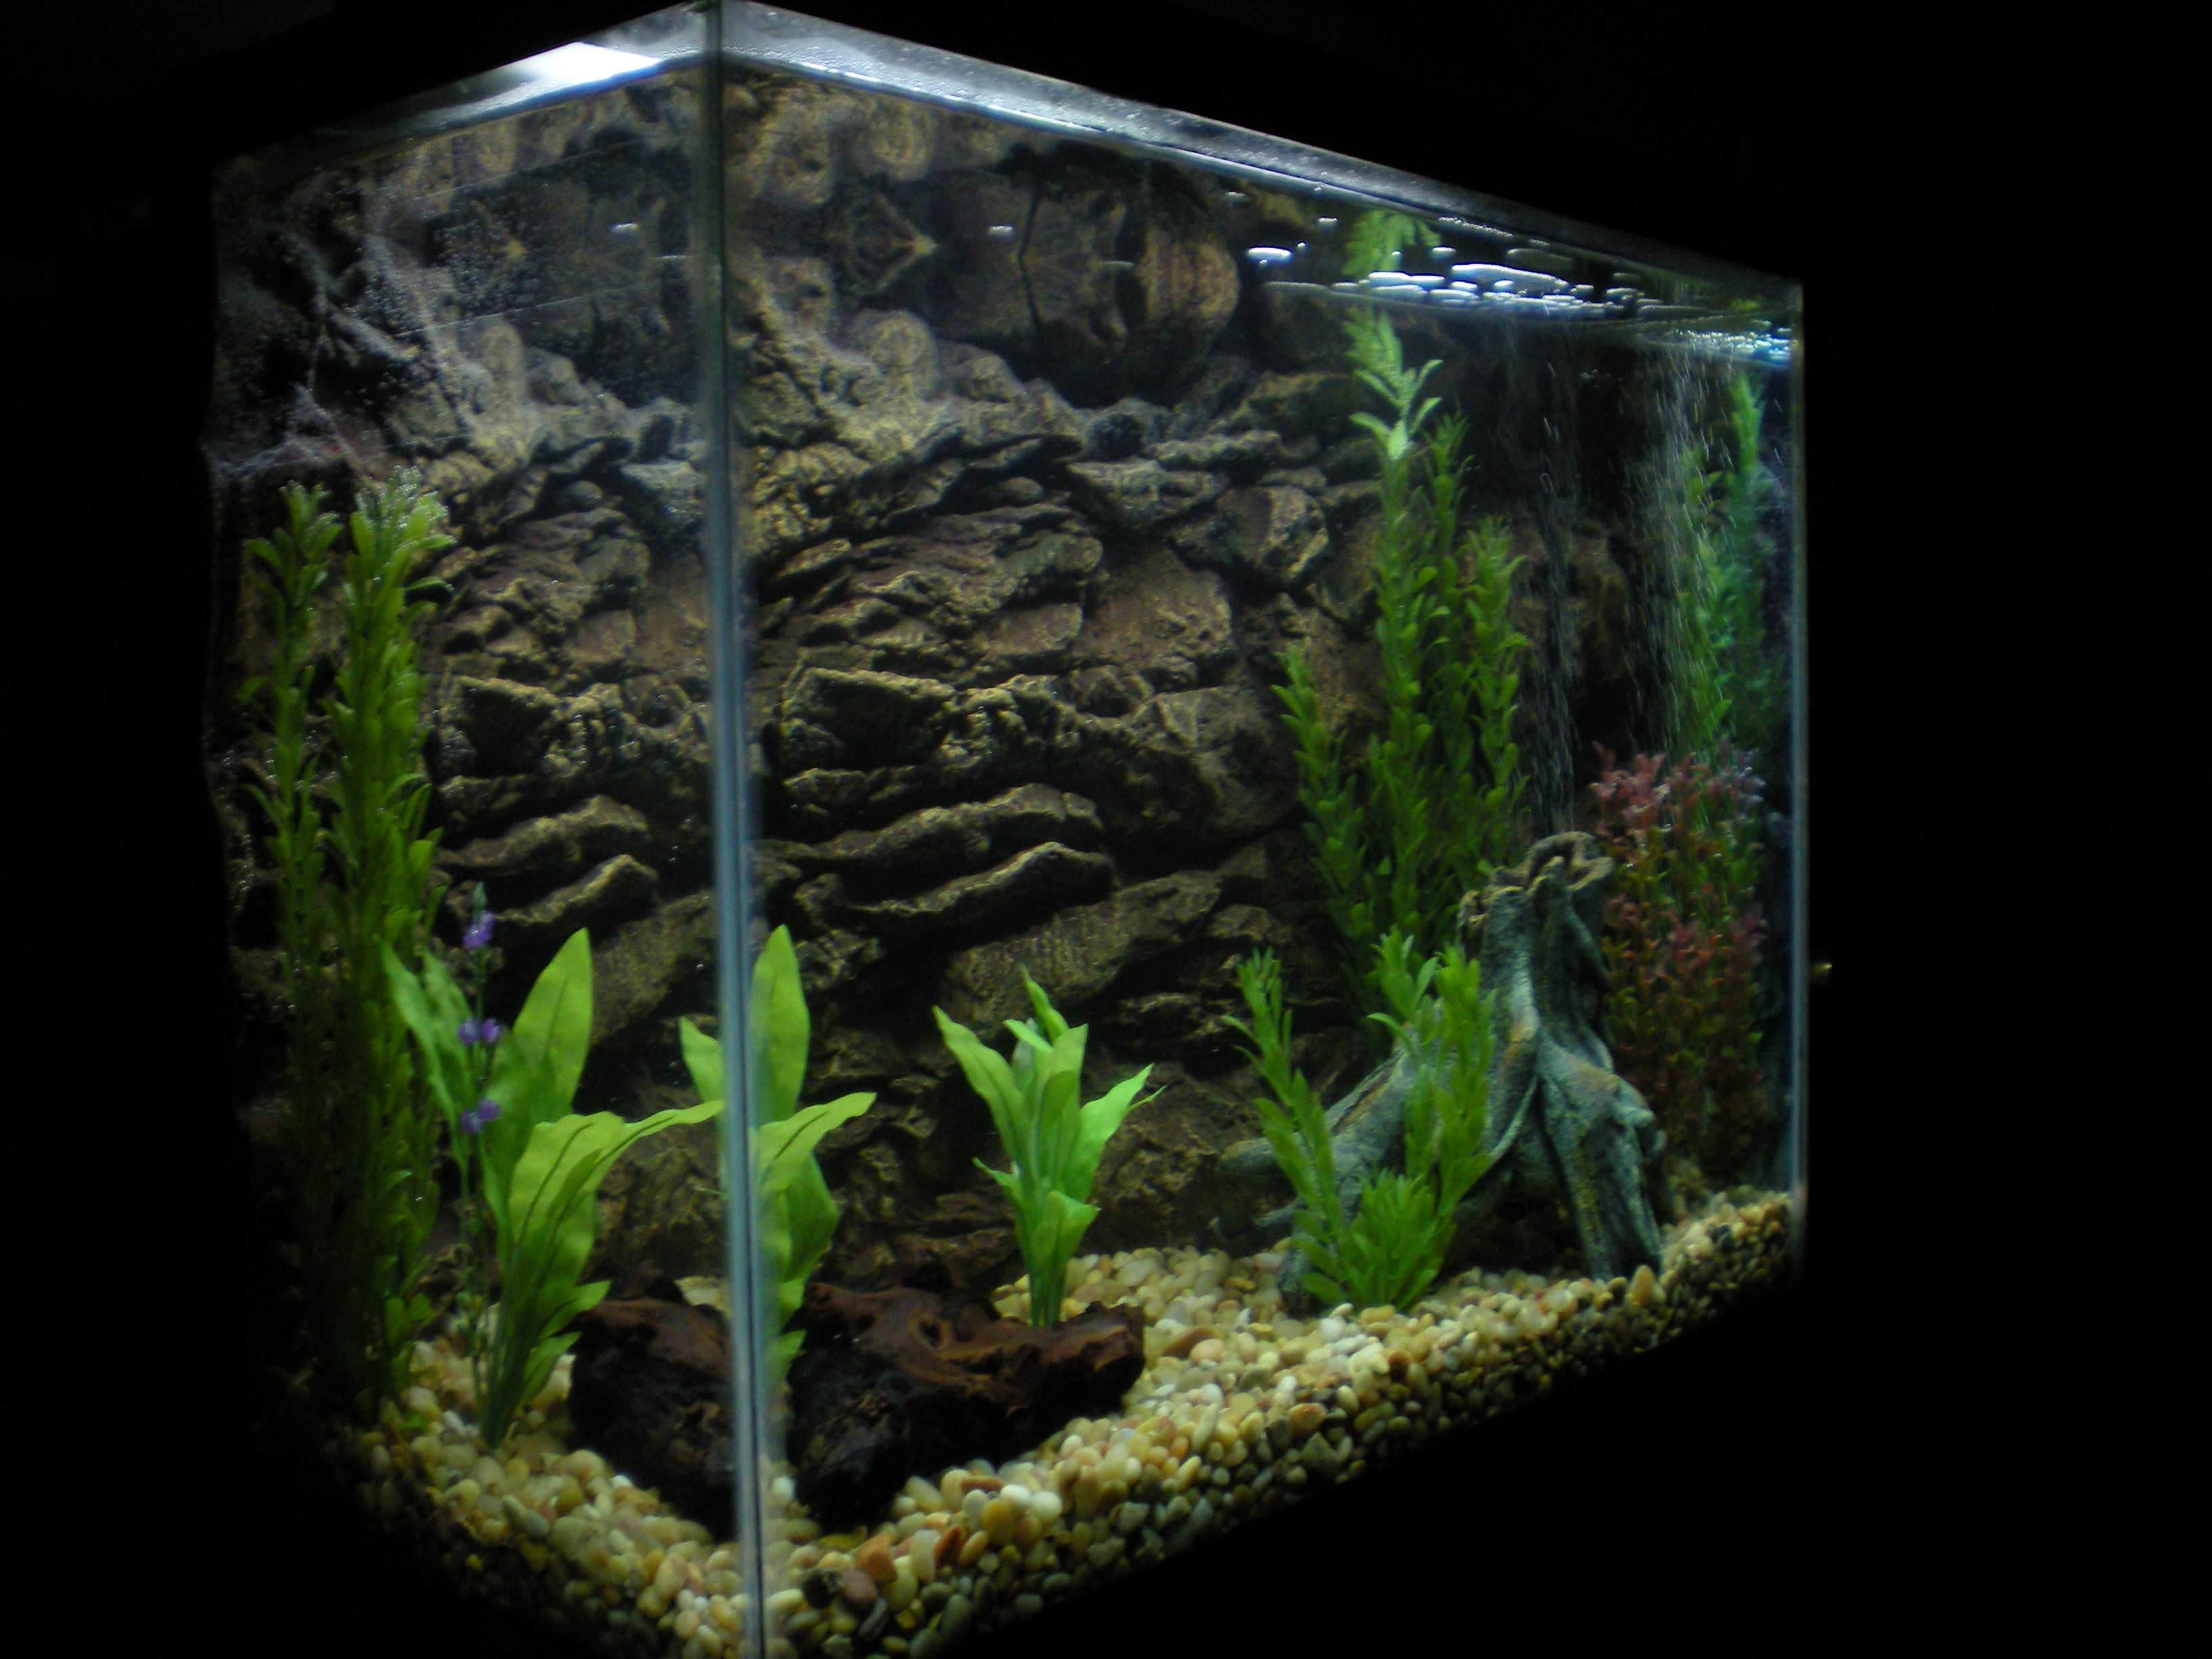 25 aquarium backgrounds wallpapers freecreatives for Small aquarium fish